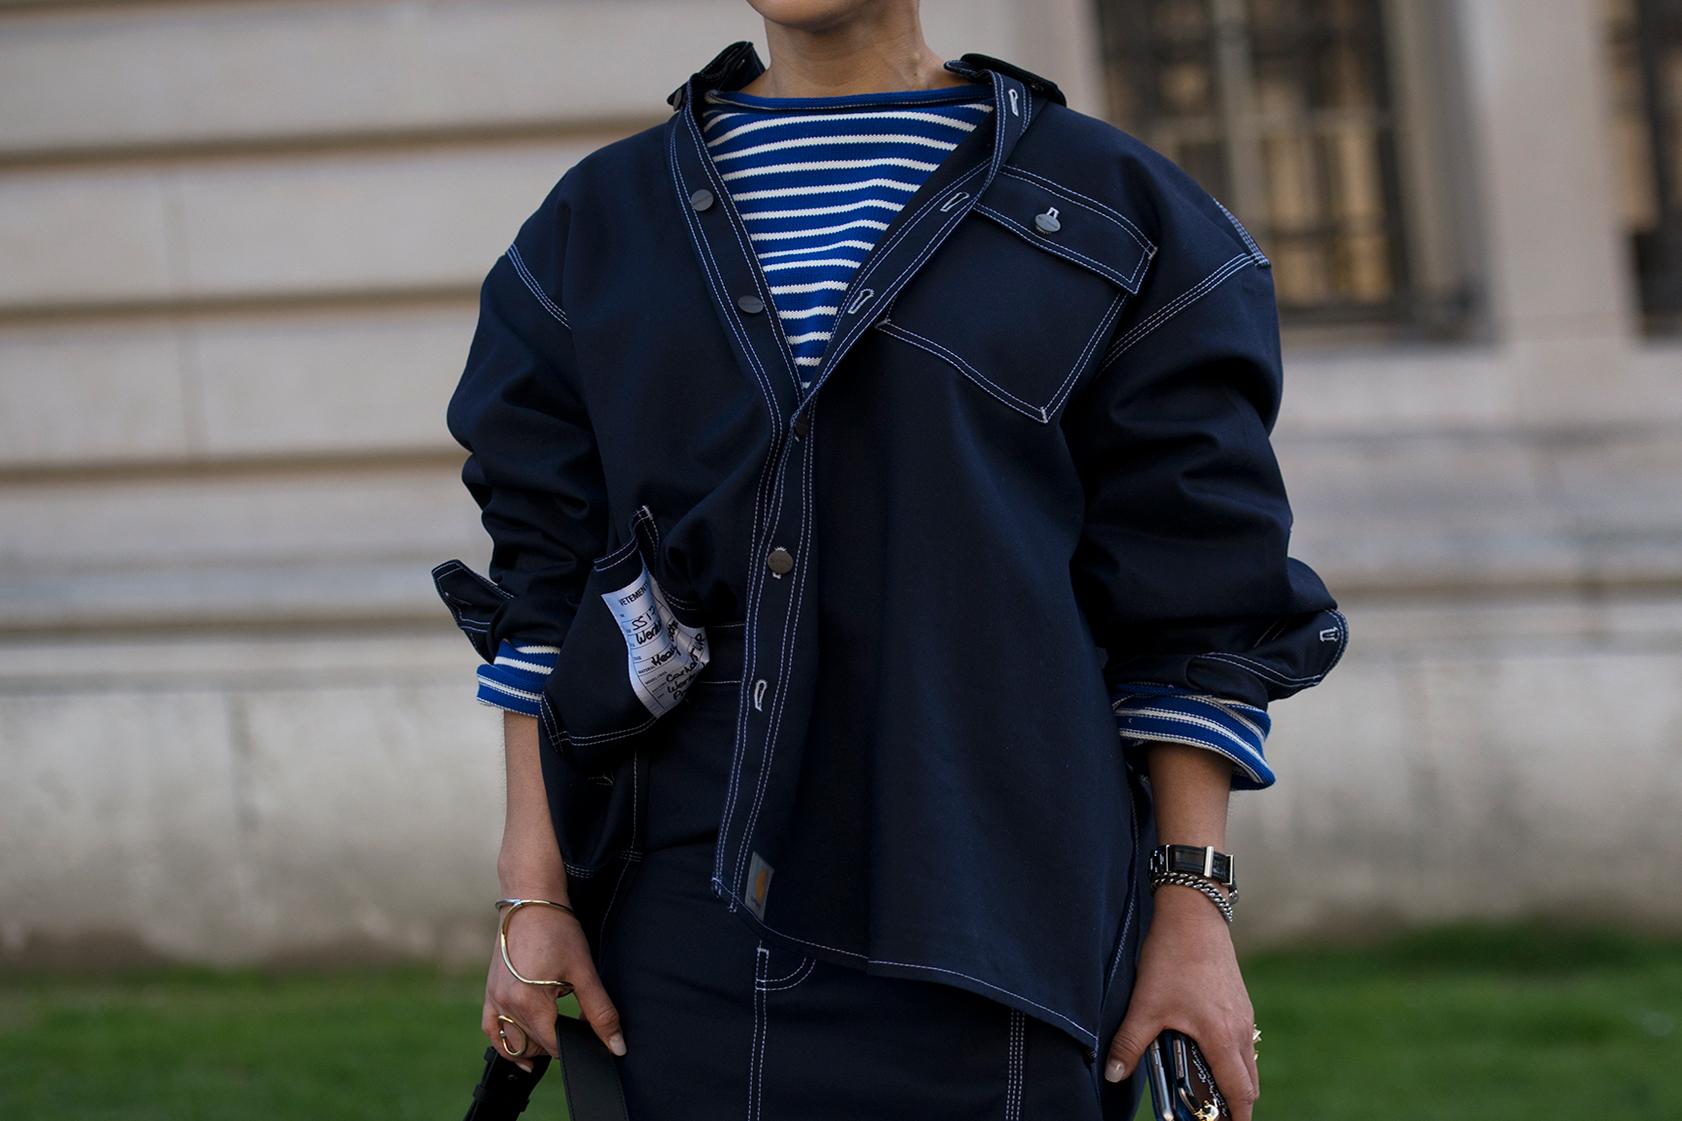 Streetsnaps Paris Fashion Week March 2017 Part 1 Hypebeast - 3744007